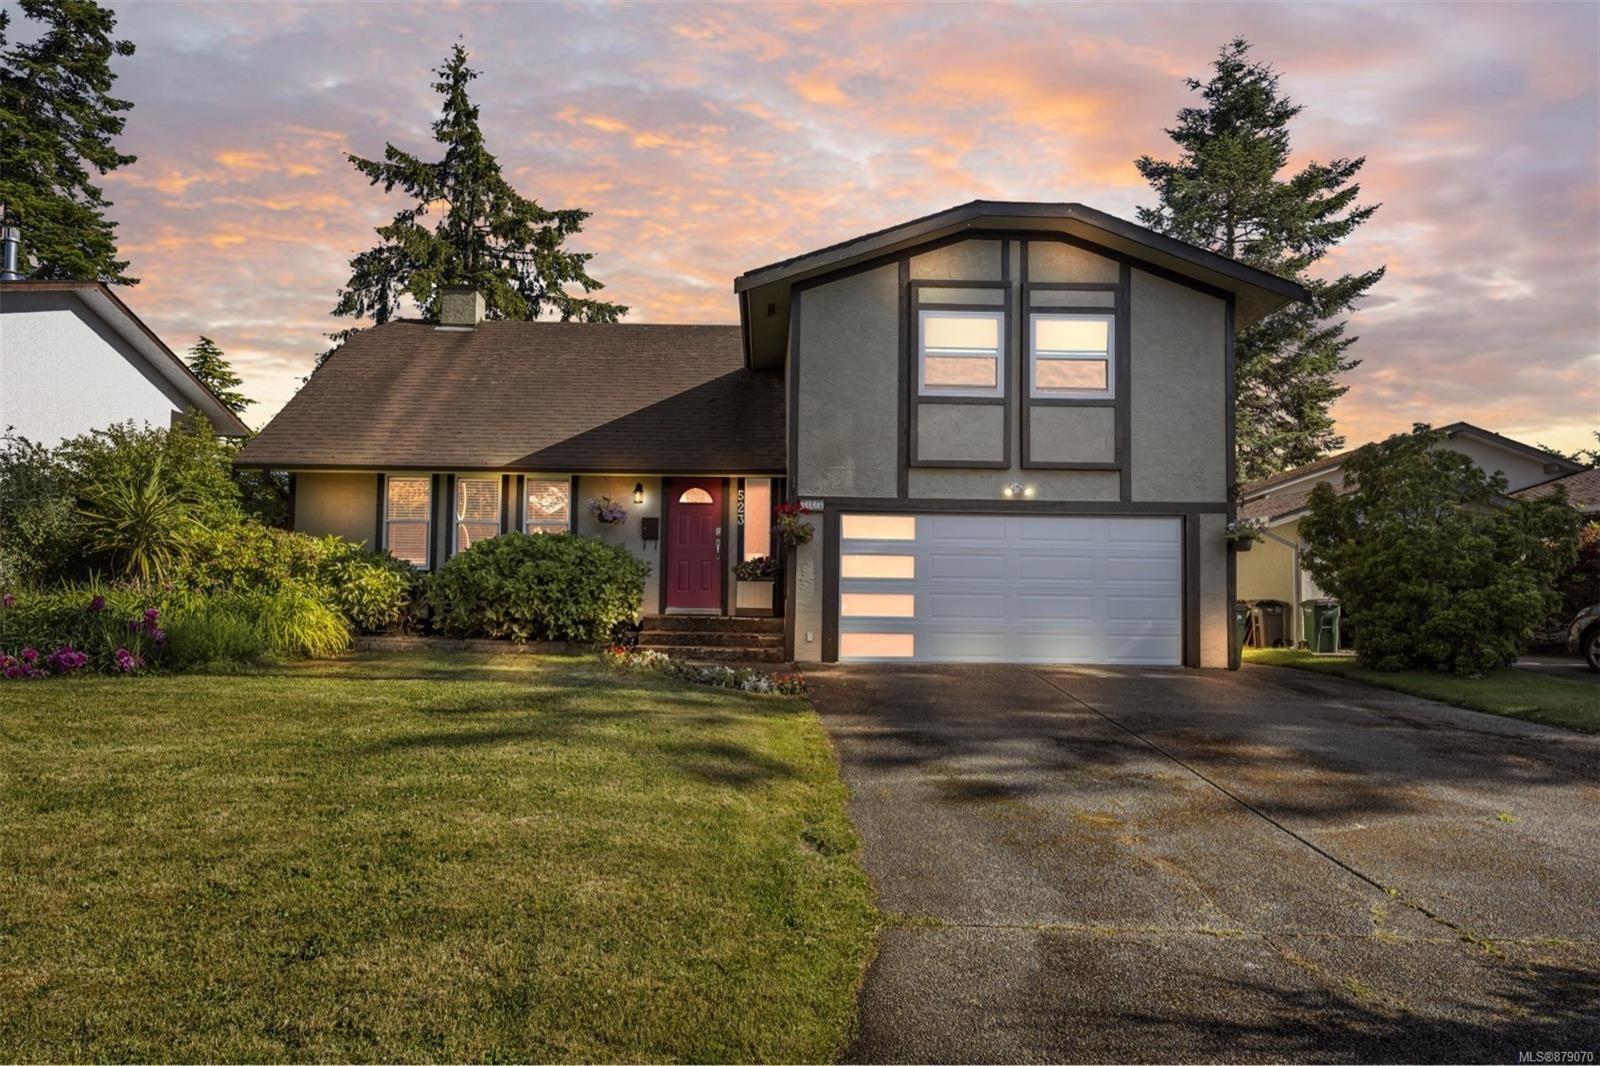 Main Photo: 523 Leaside Pl in Saanich: SW Glanford House for sale (Saanich West)  : MLS®# 879070